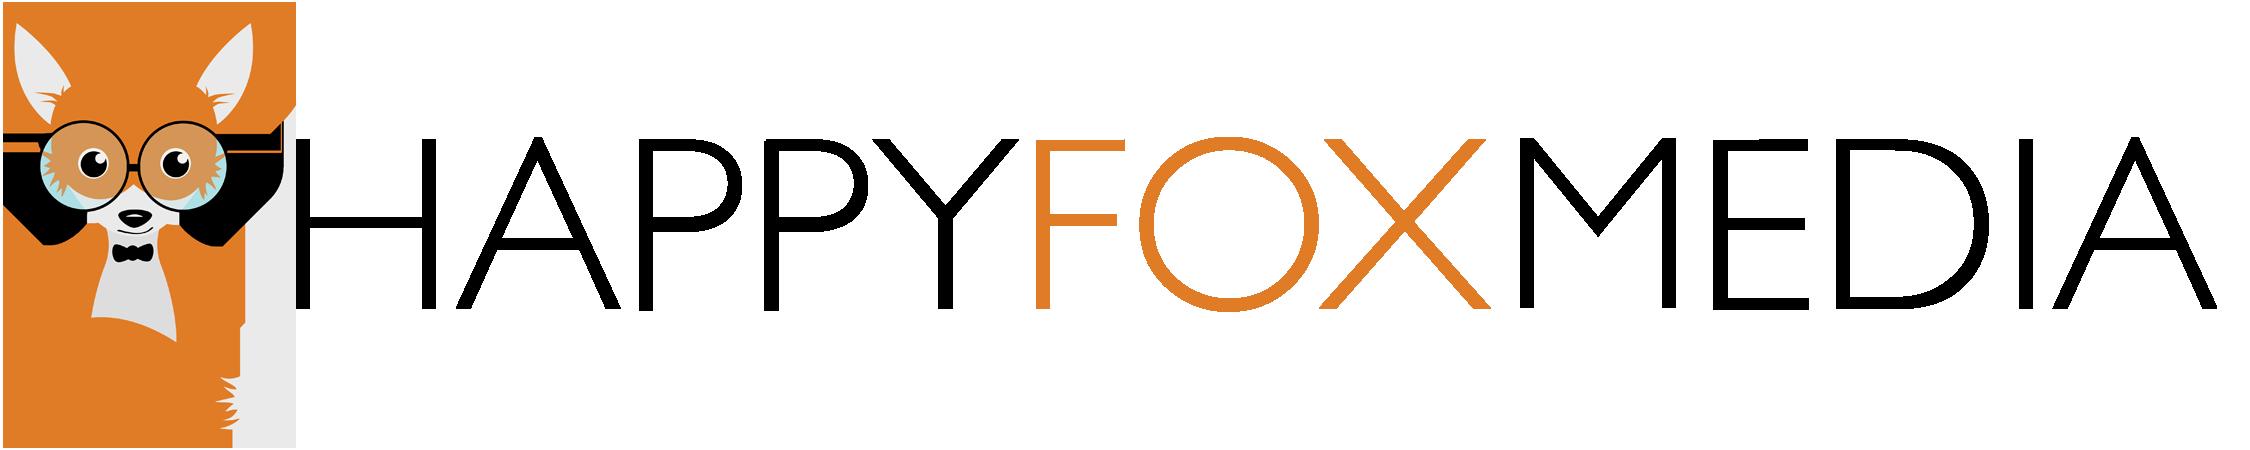 Happy Fox Media Logo.png